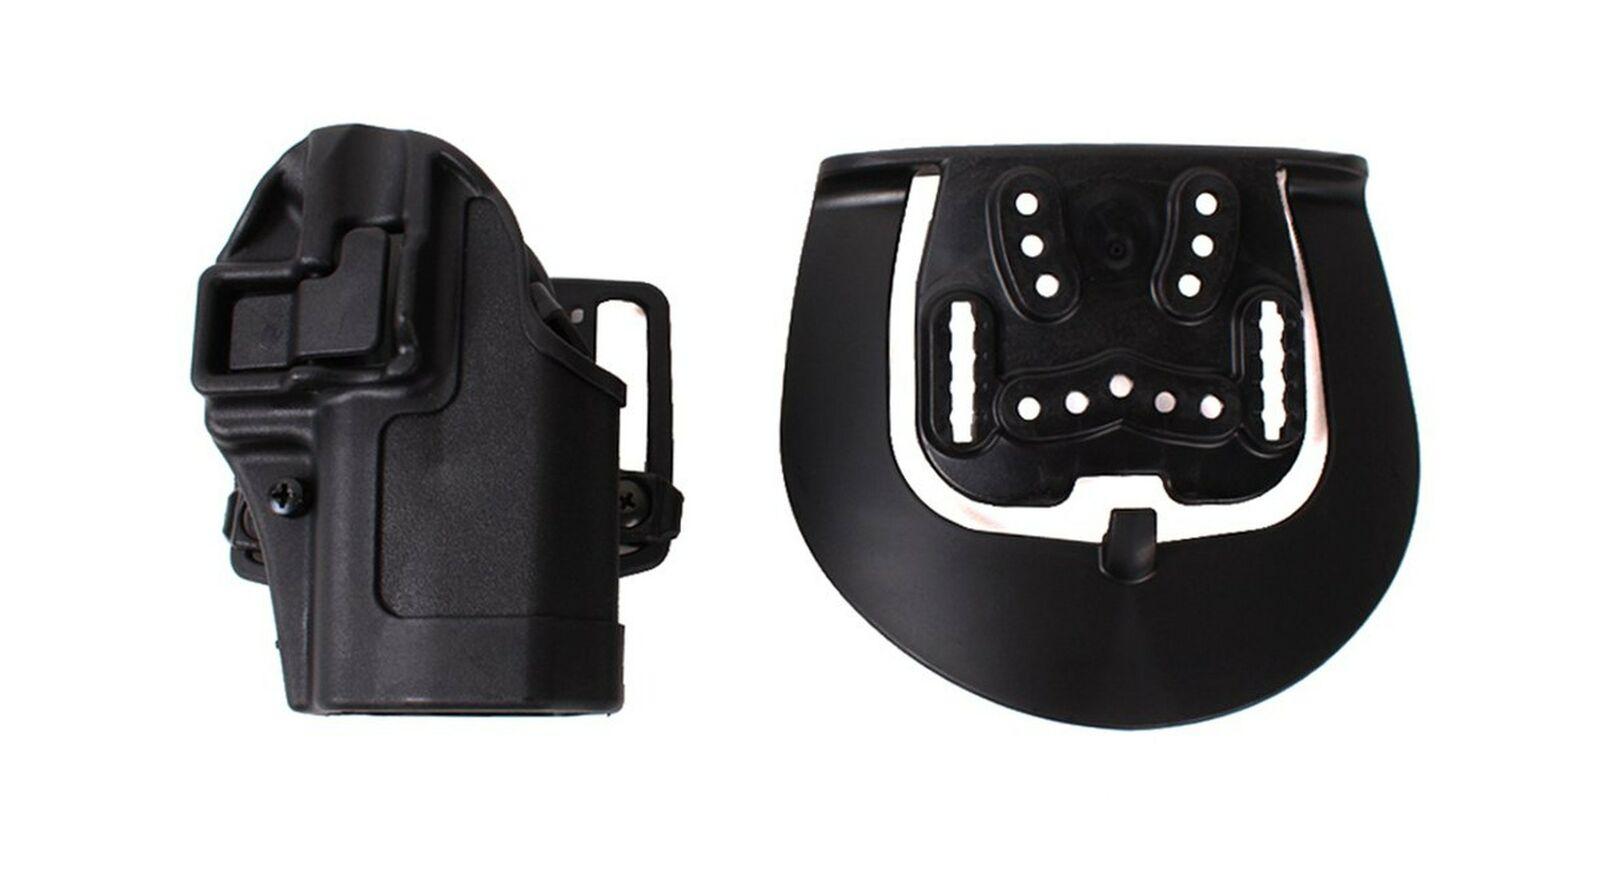 Blackhawk 40AH12BKR CQC Ankle Holster Sz 12 for sale online